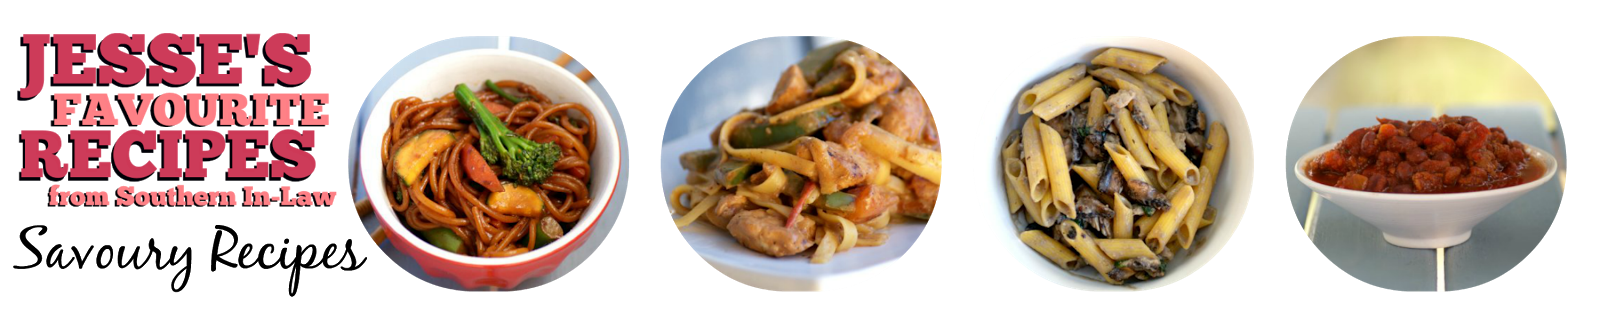 Healthy Dinner Recipes - Gluten Free, Low Fat, Sugar Free